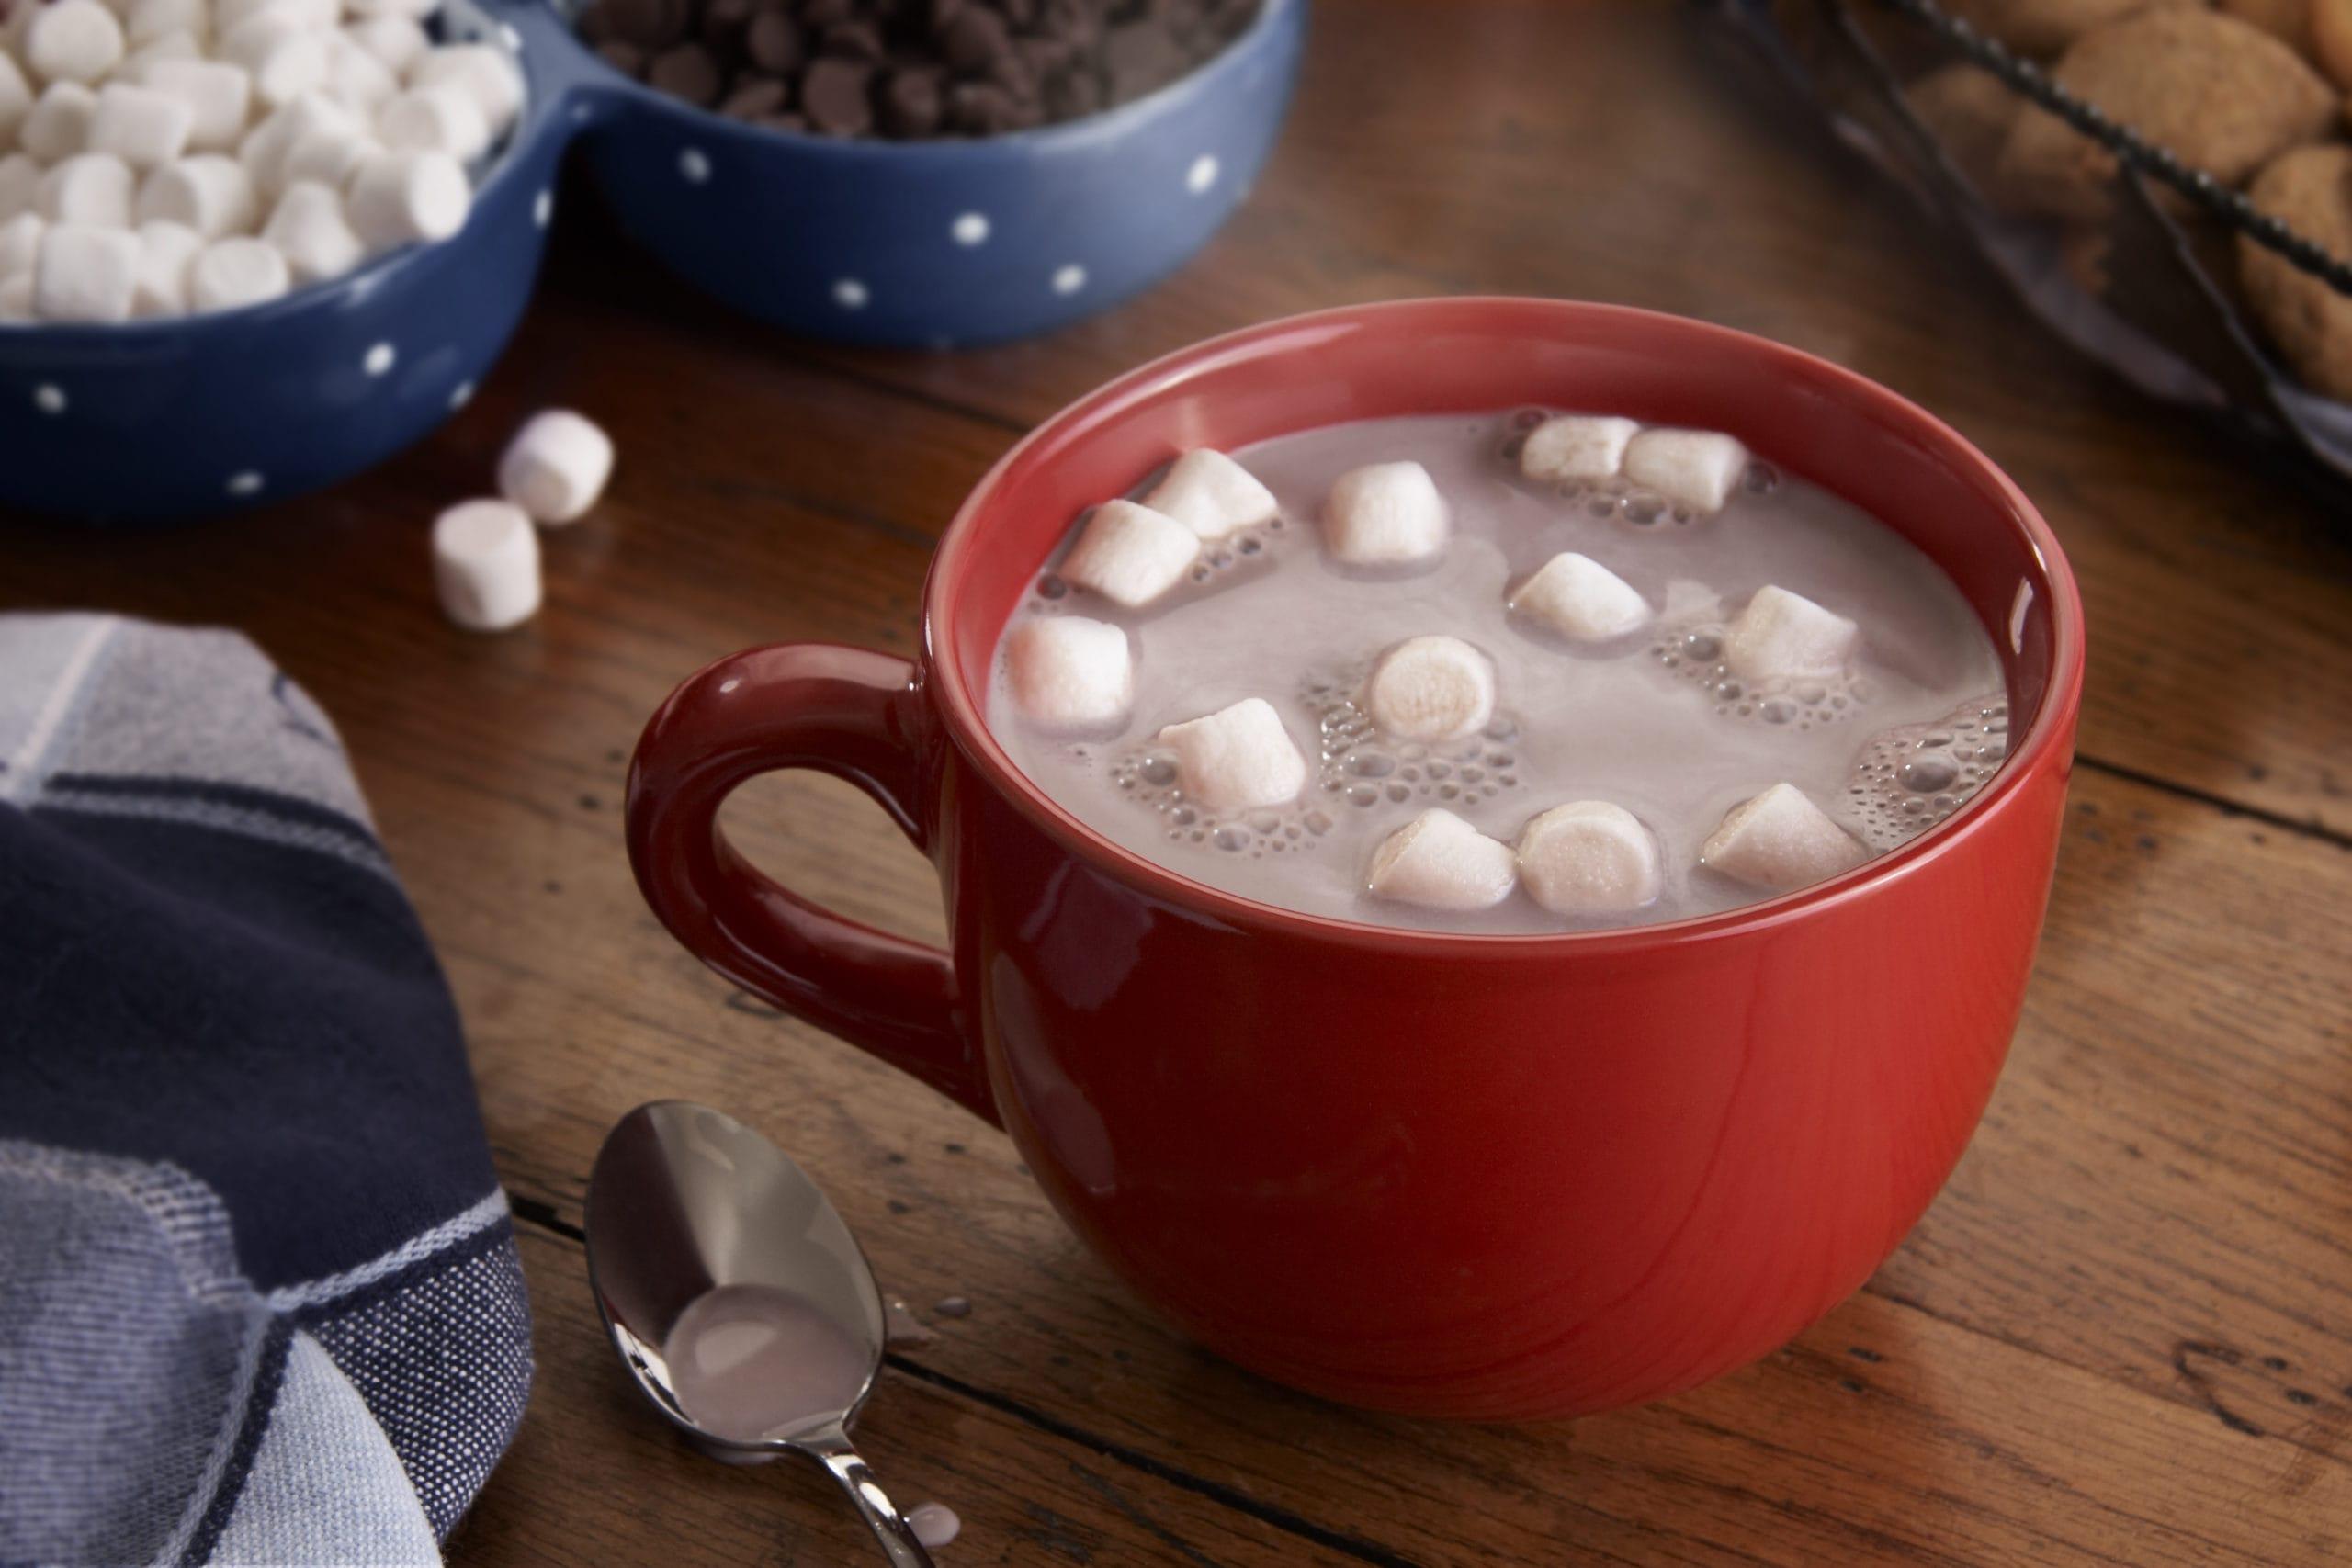 a mug filled with hot chocolate